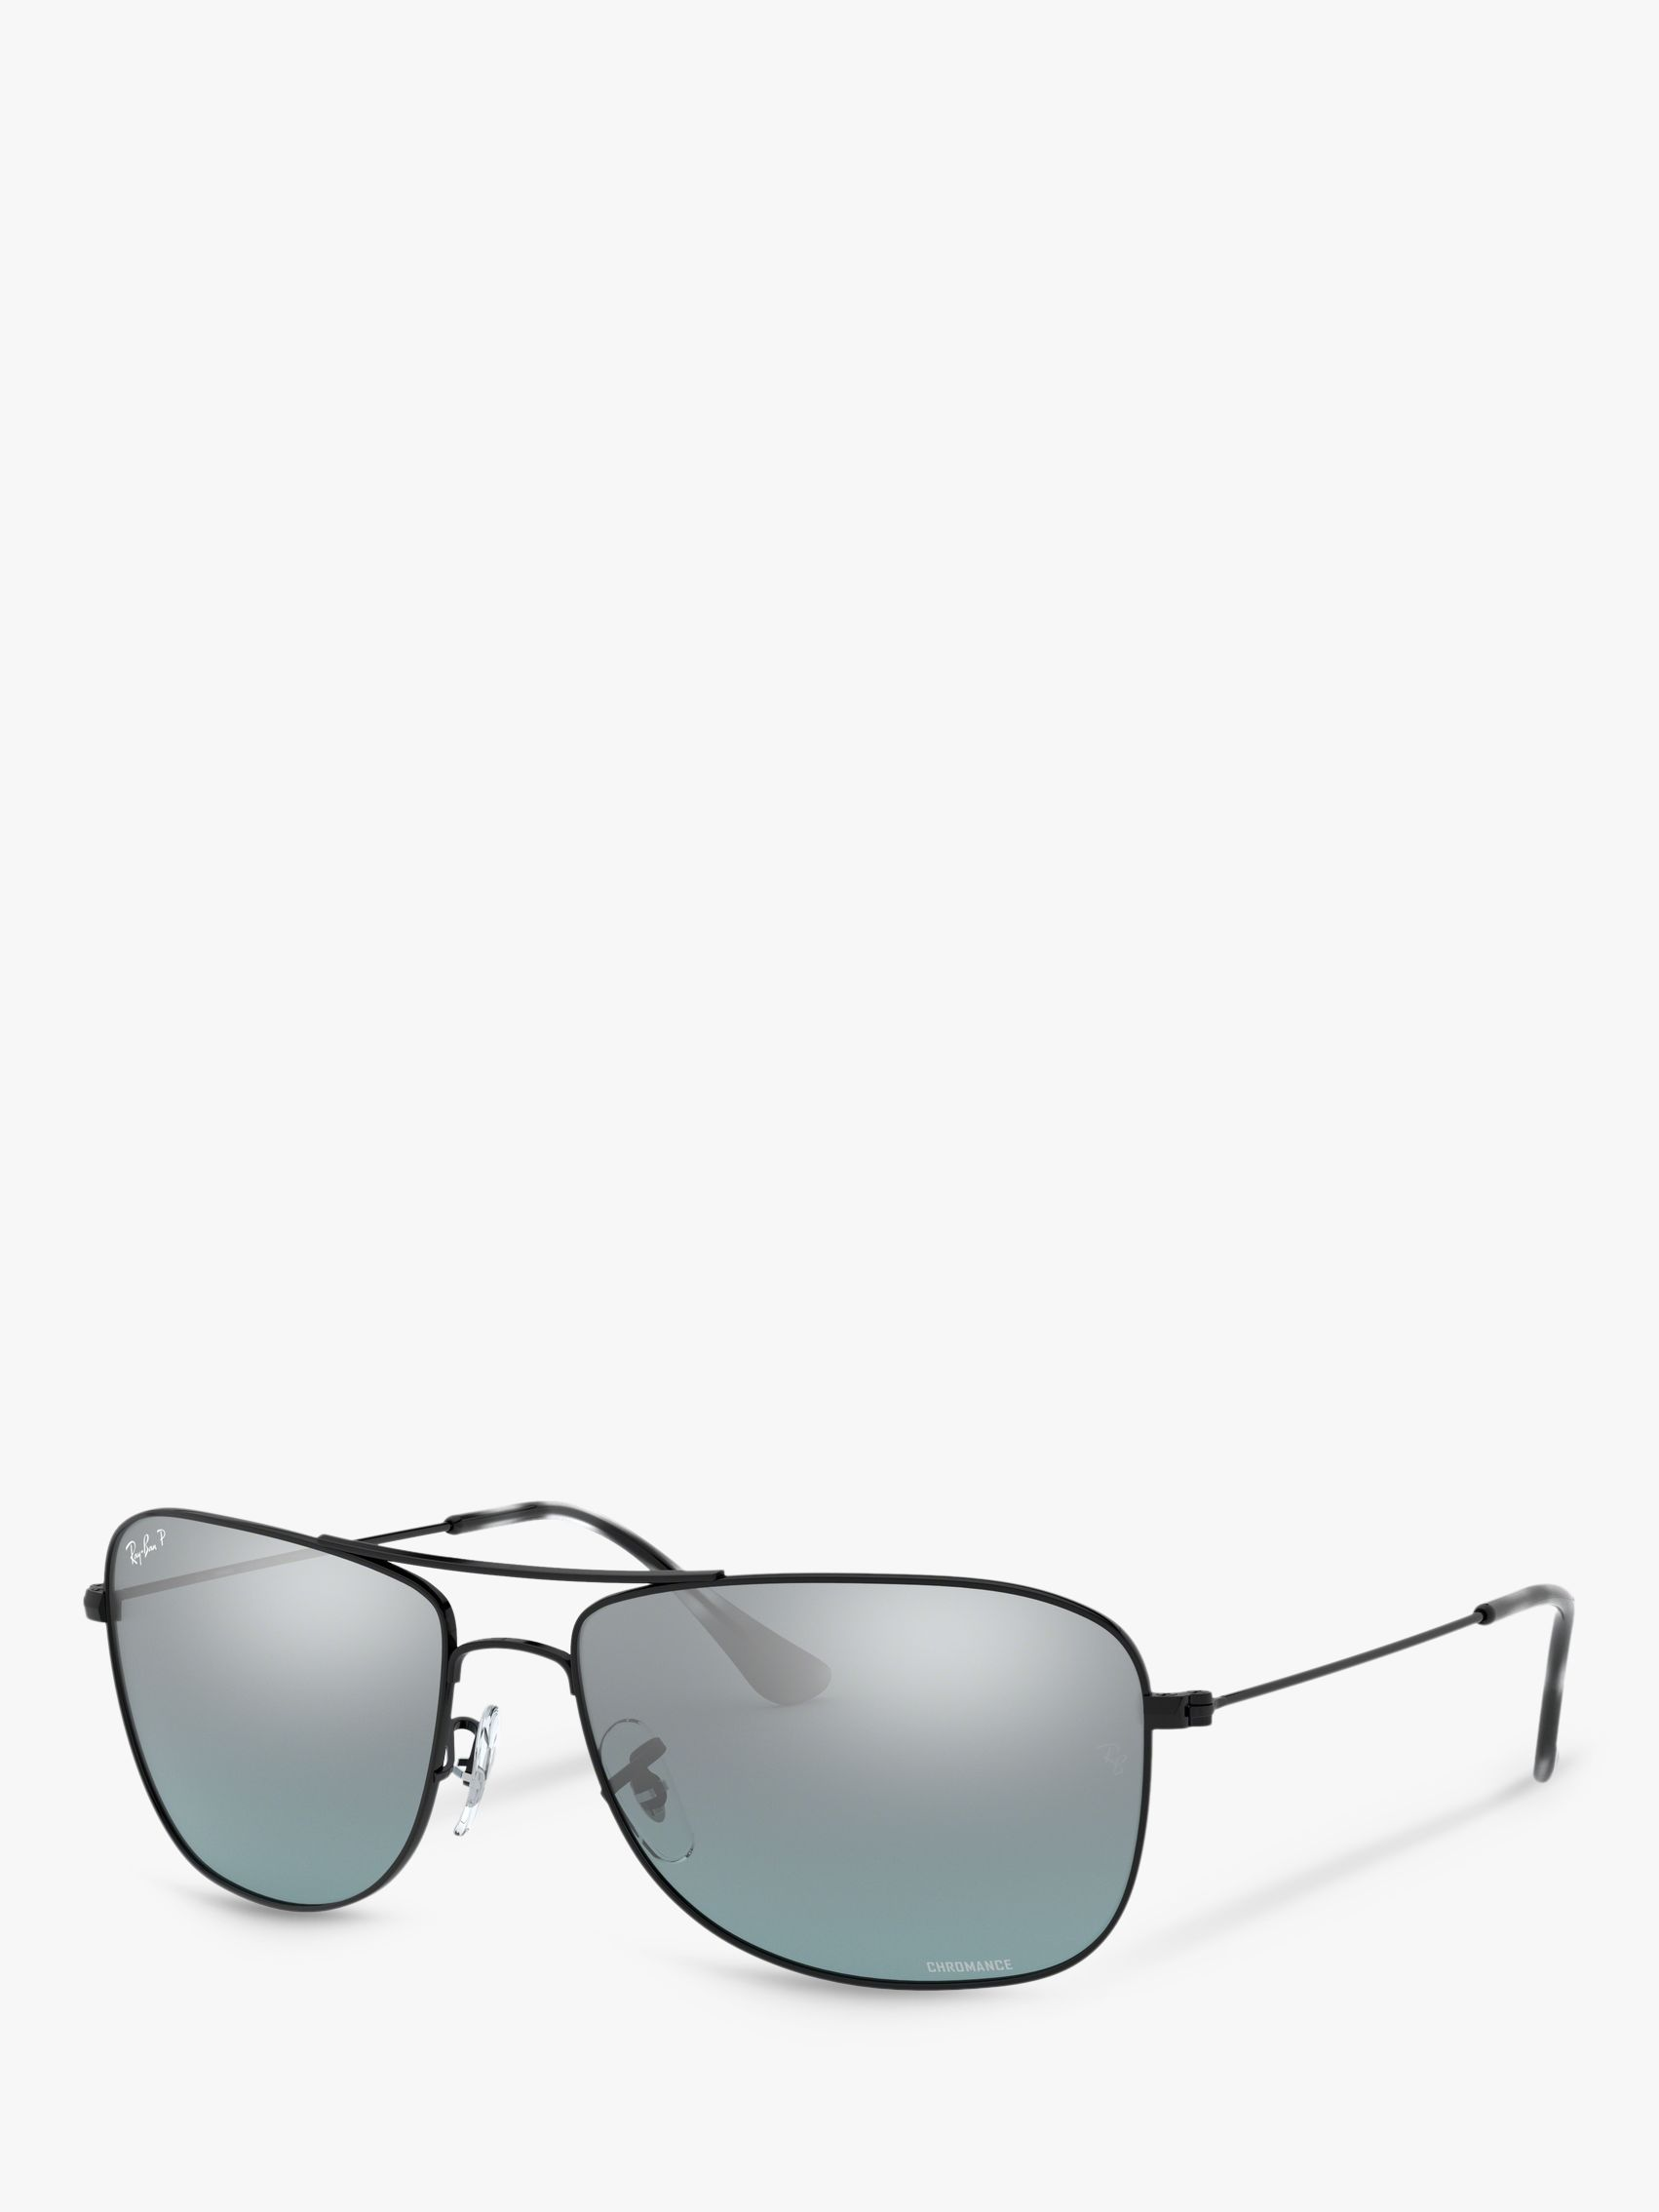 f0661d3354 Ray-Ban RB3543 Women's Polarised Aviator Sunglasses, Black/Mirror Silver